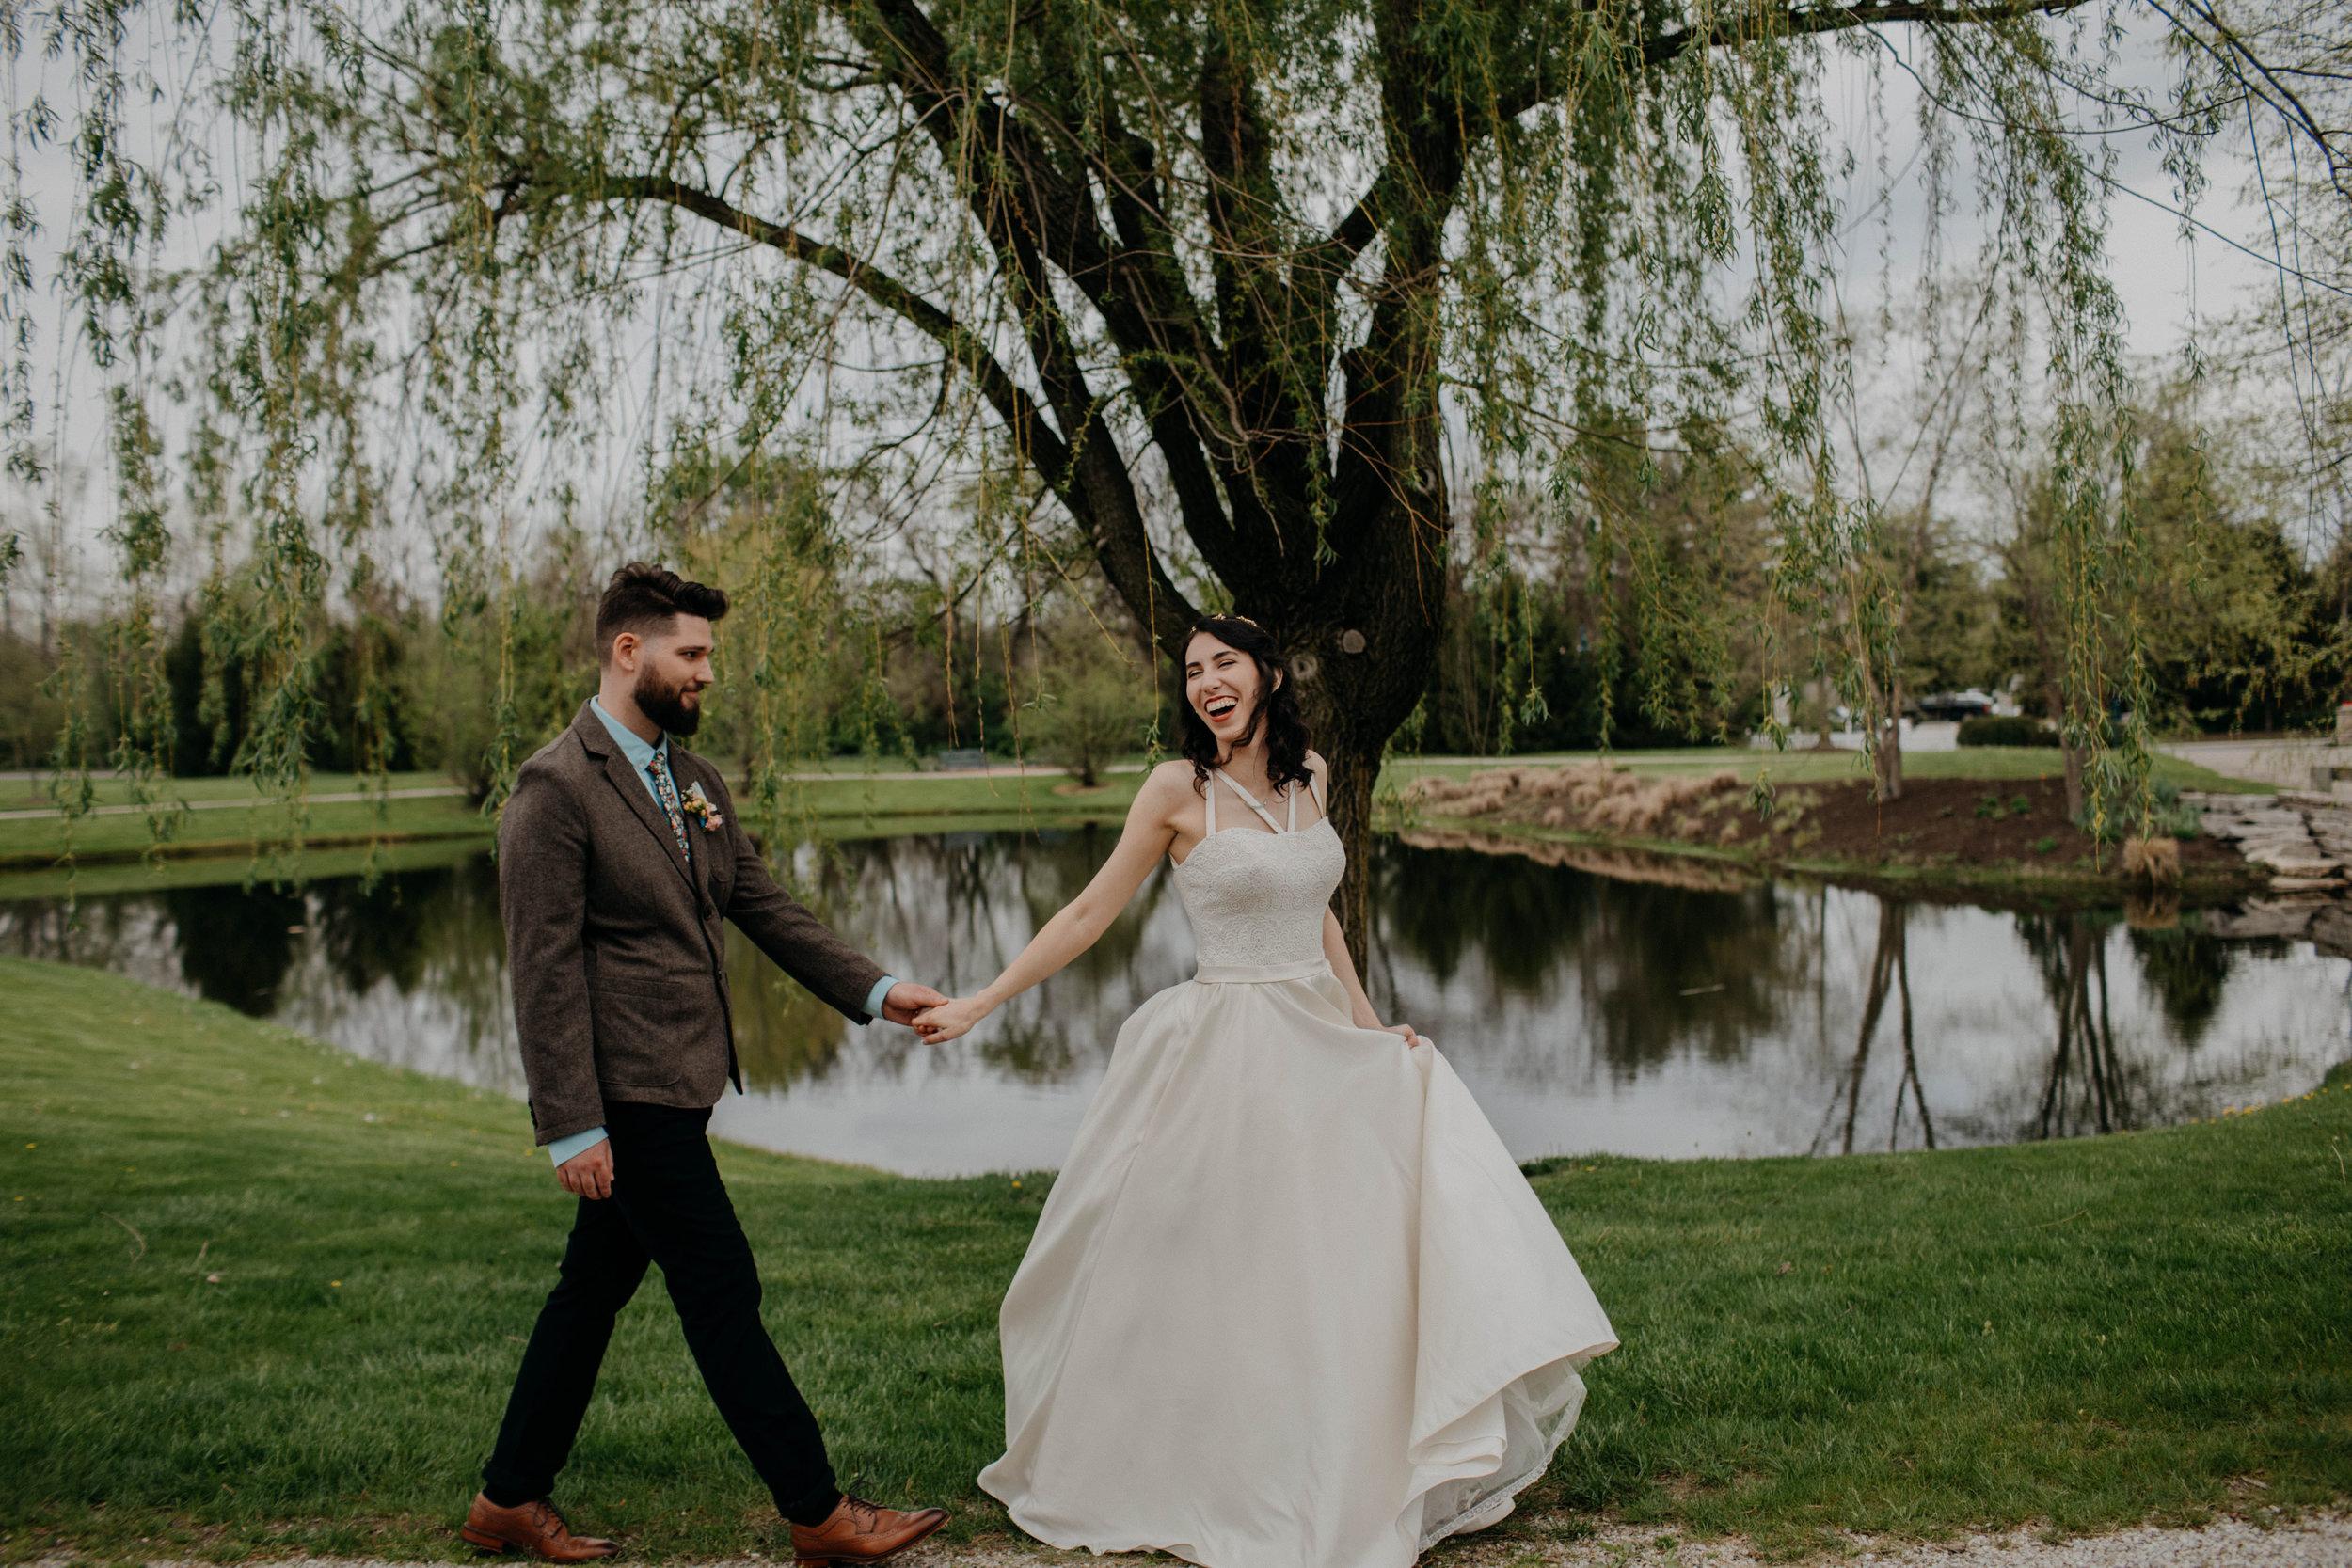 Columbus, Ohio Wedding Photographer Everal Barn At Heritage Park Wedding Venue Grace E Jones Photography163.jpg